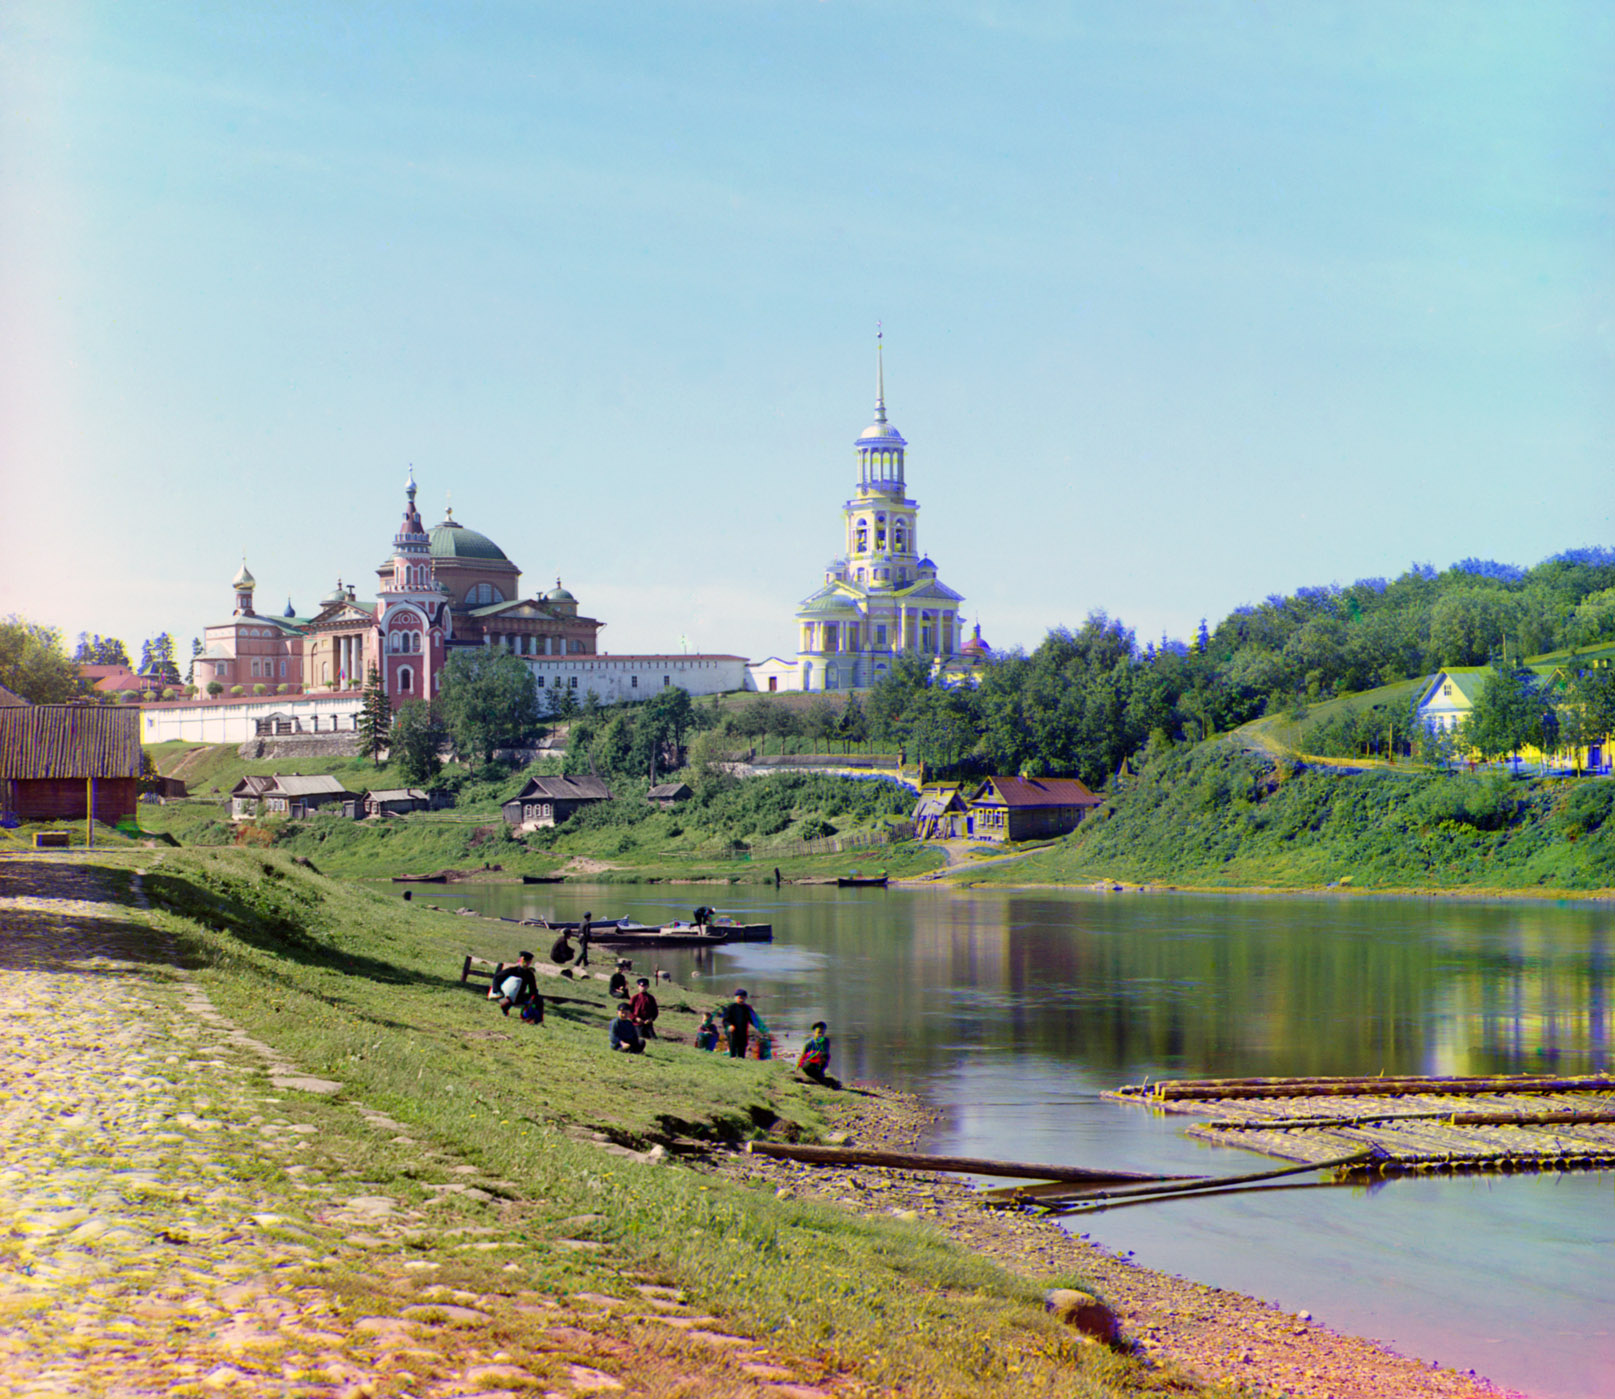 Вид наБорисоглебский монастырьот моста в начале XX века